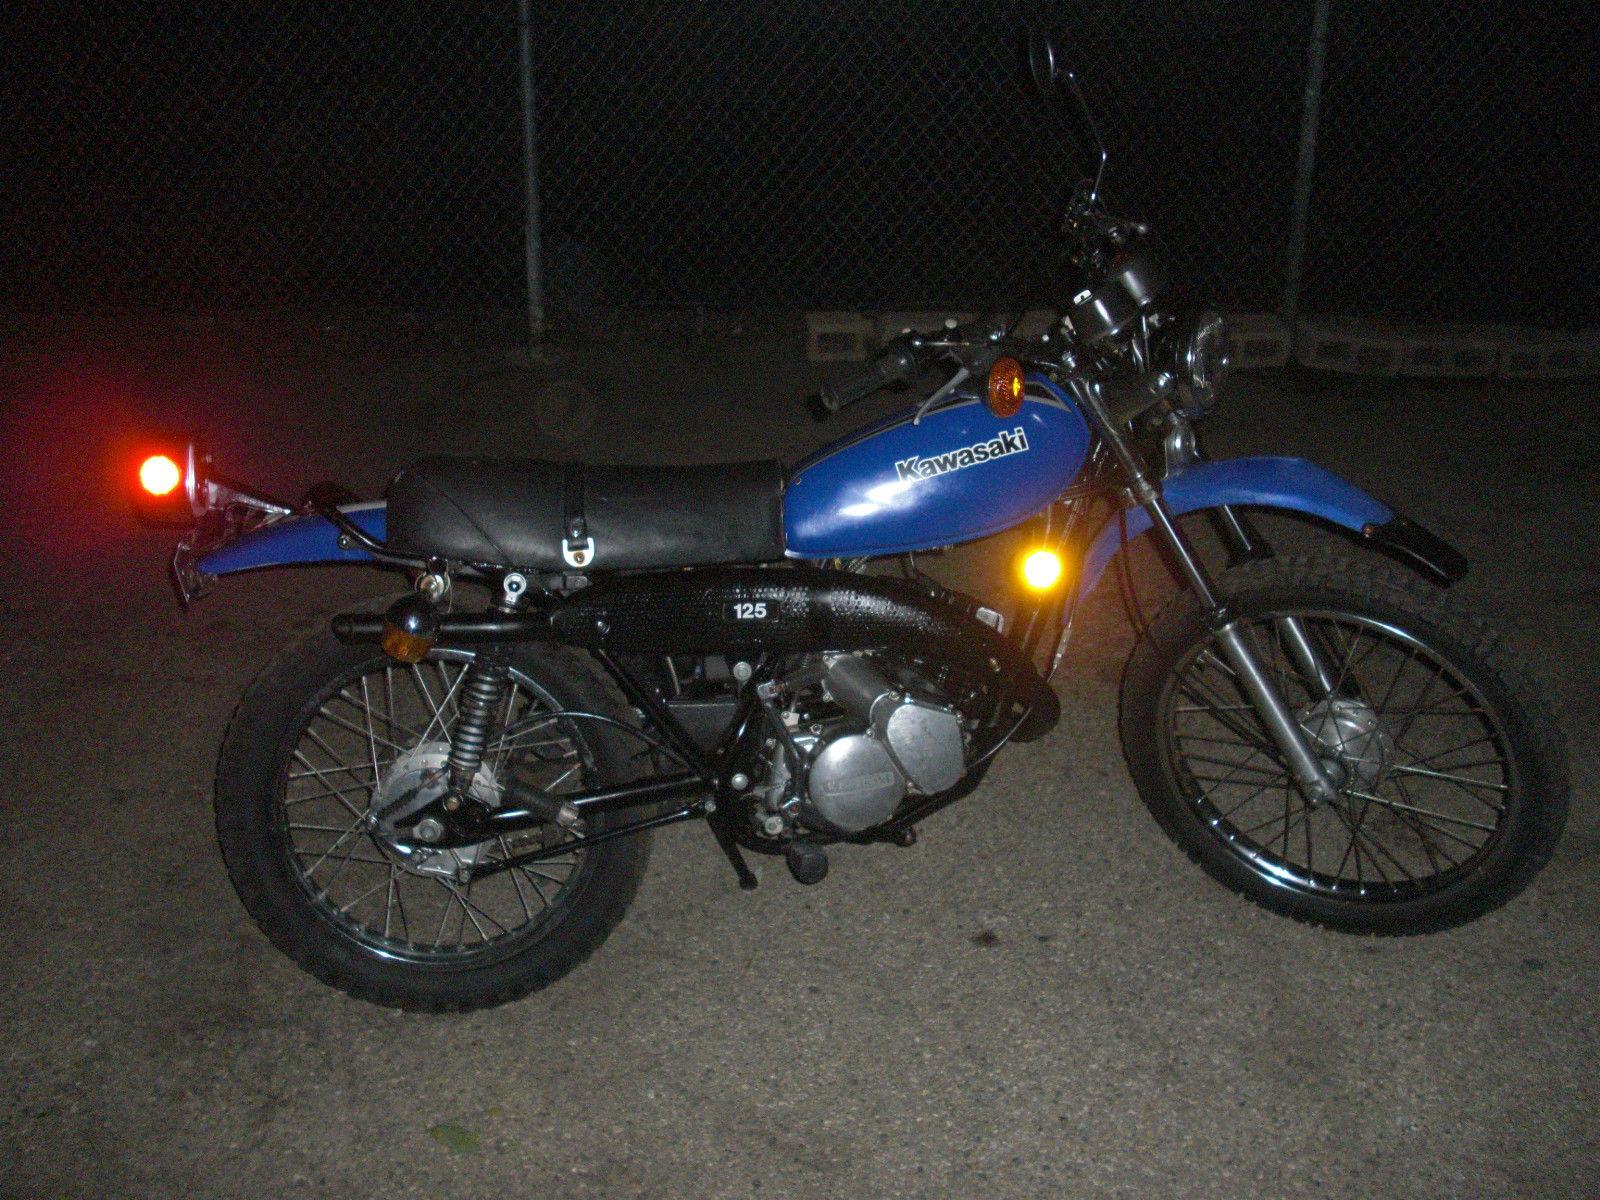 Vintage 1979 Blue Kawasaki Ke 125 Motorcycle Enduro Motor